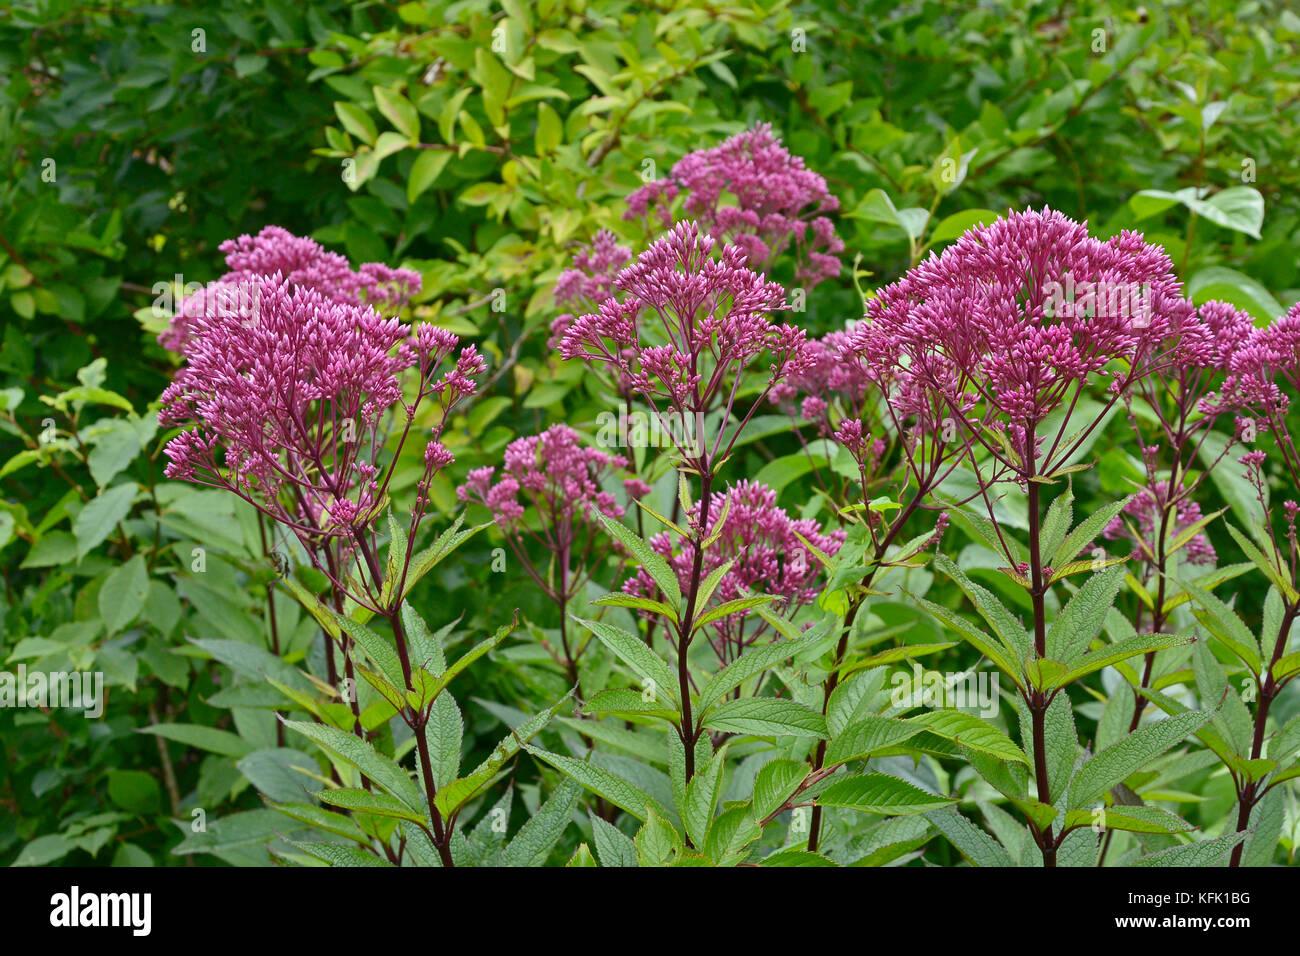 Eupatorium dubium 'Baby Joe' in a flower border - Stock Image